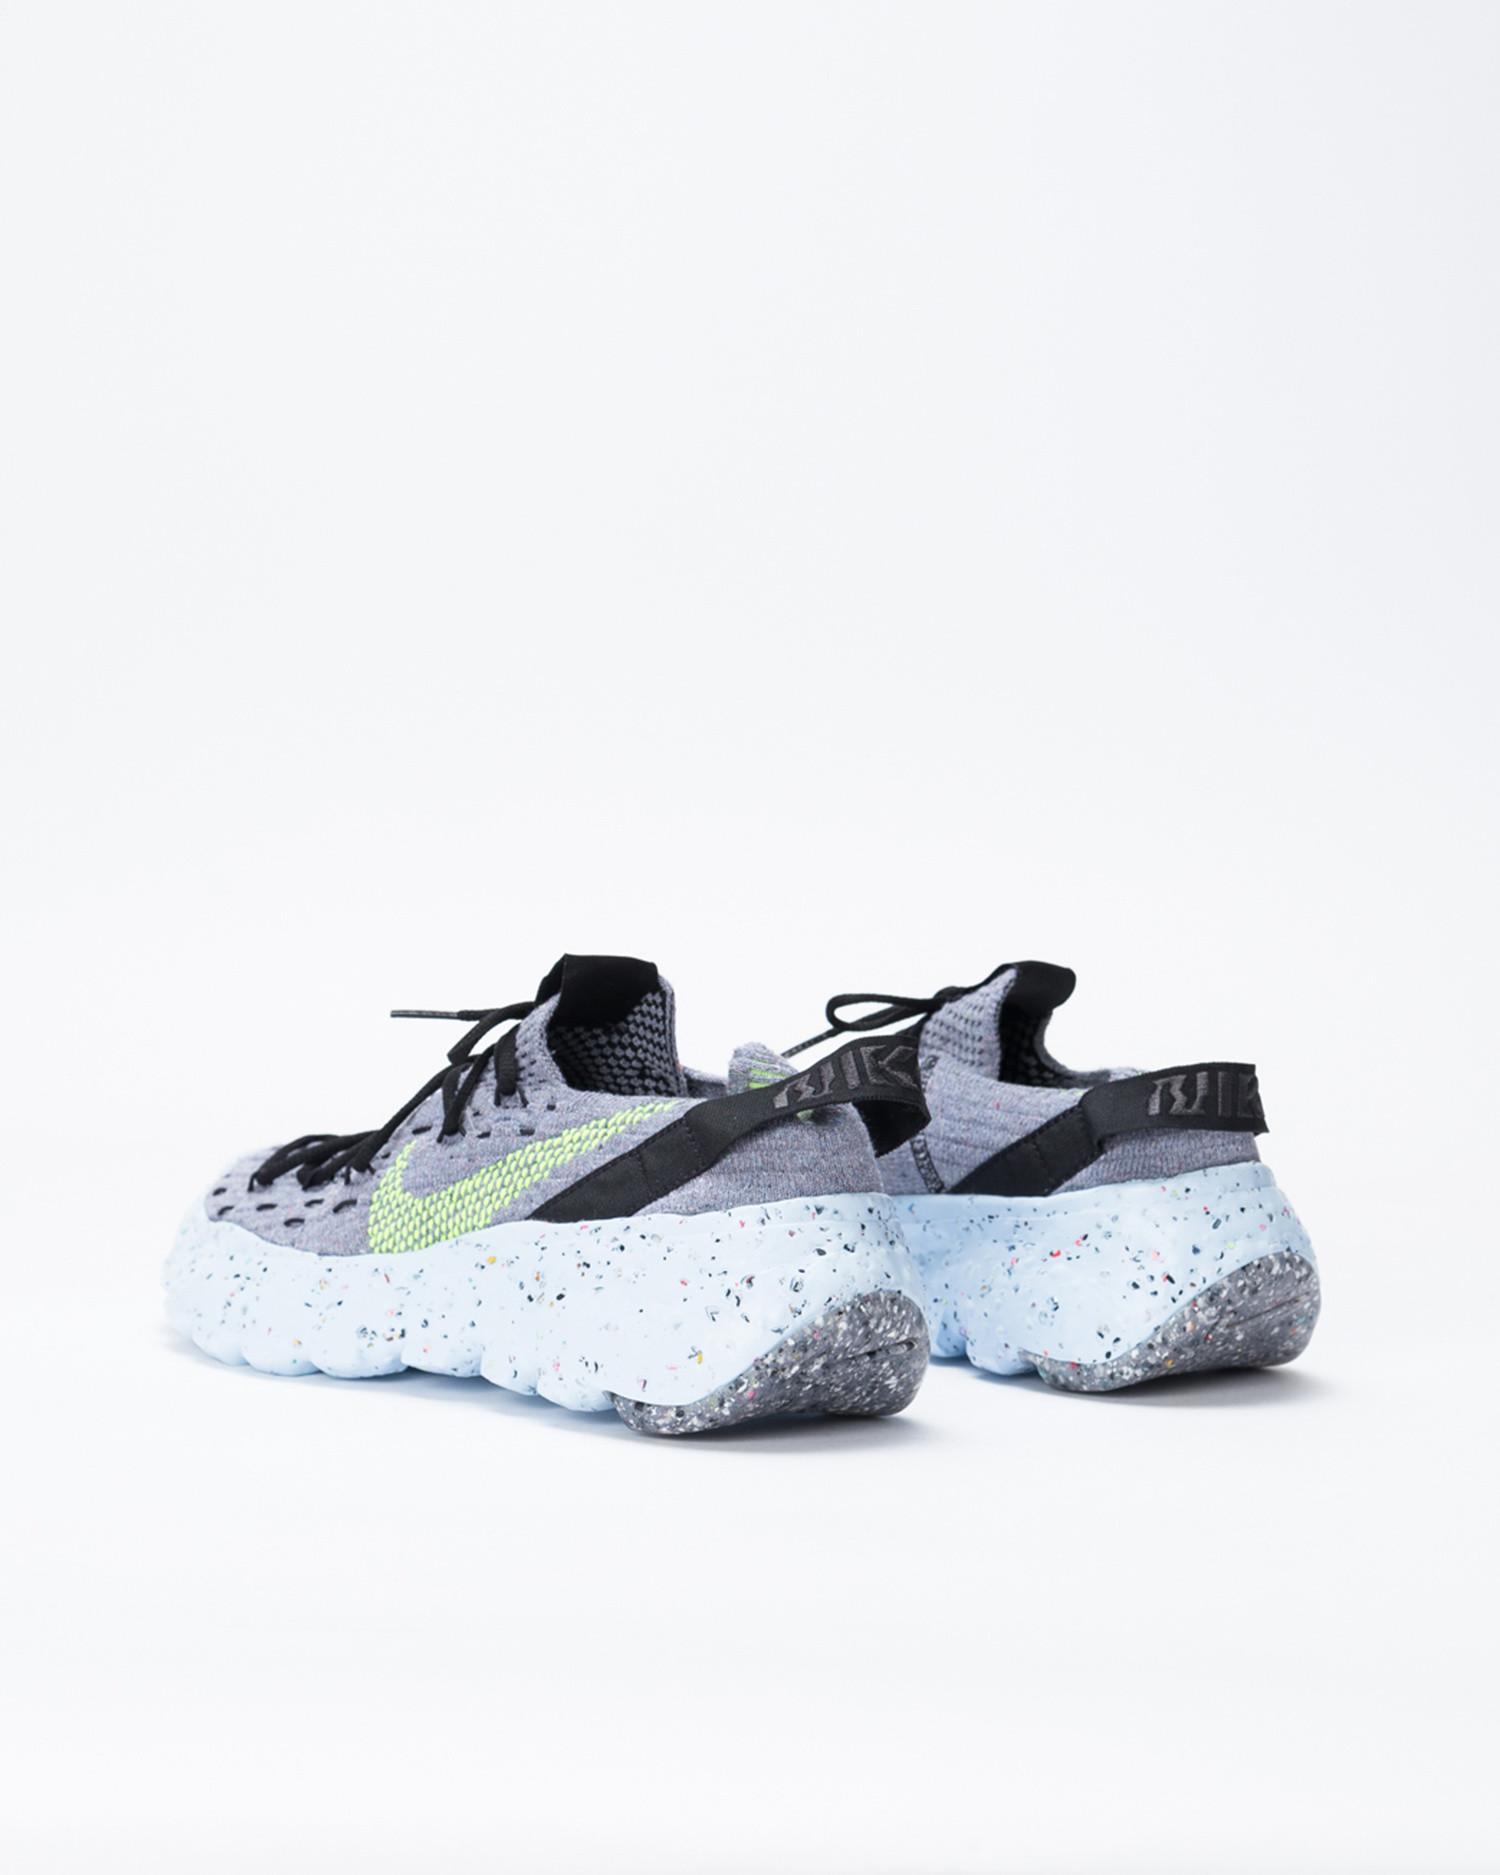 Nike W Space Hippie 04 Grey/Volt-Black-DK Smoke Grey